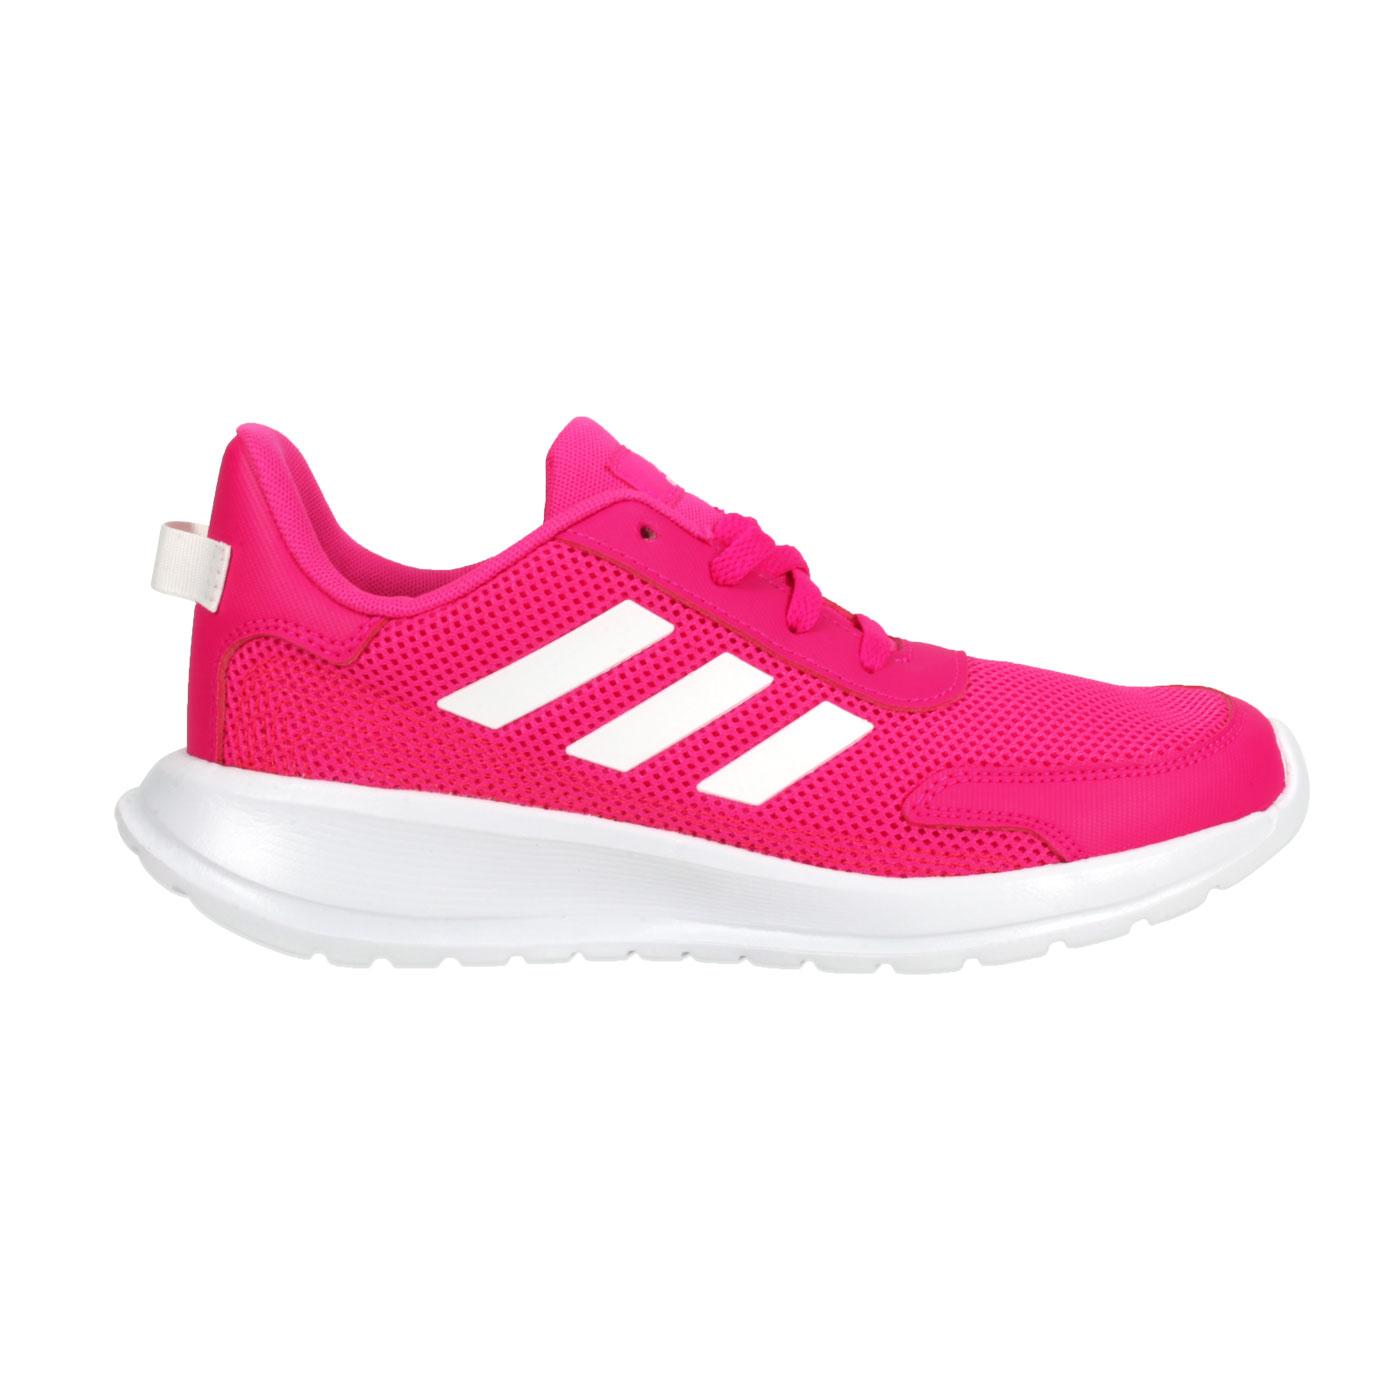 ADIDAS 大童休閒運動鞋  @TENSAUR RUN K@EG4126 - 亮桃紅白